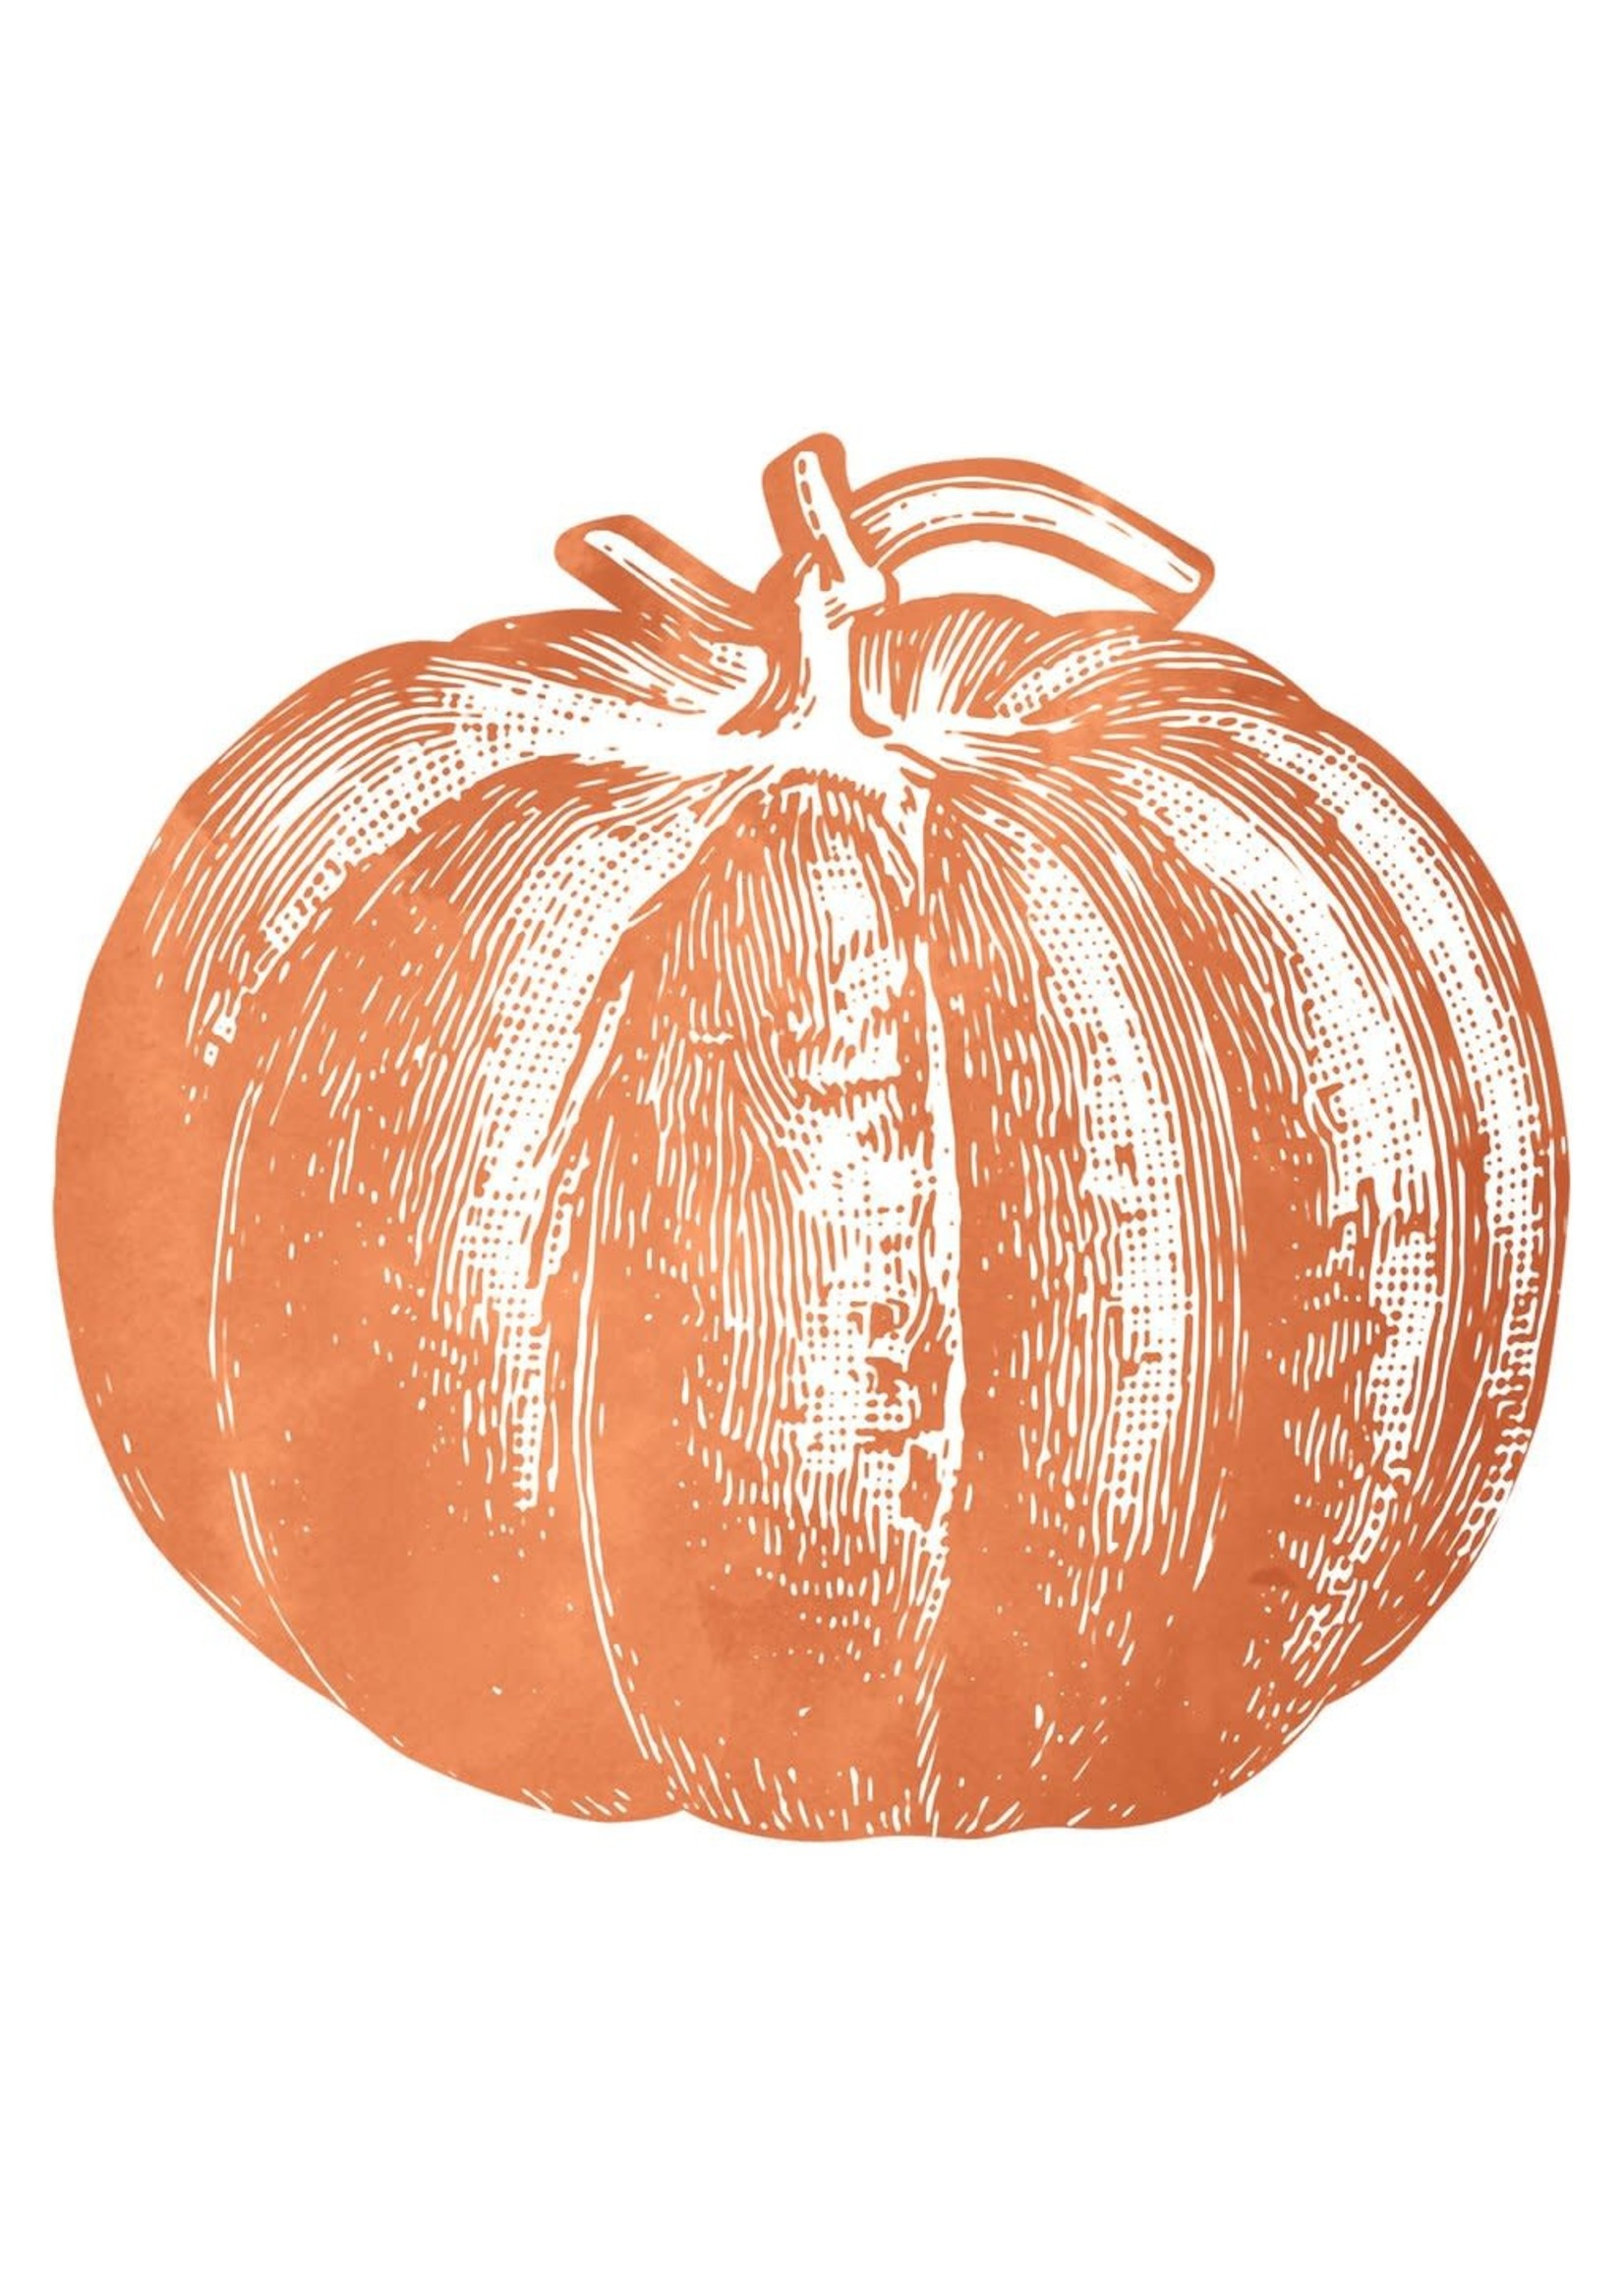 Hester & Cook Paper Placemats - Pumpkin